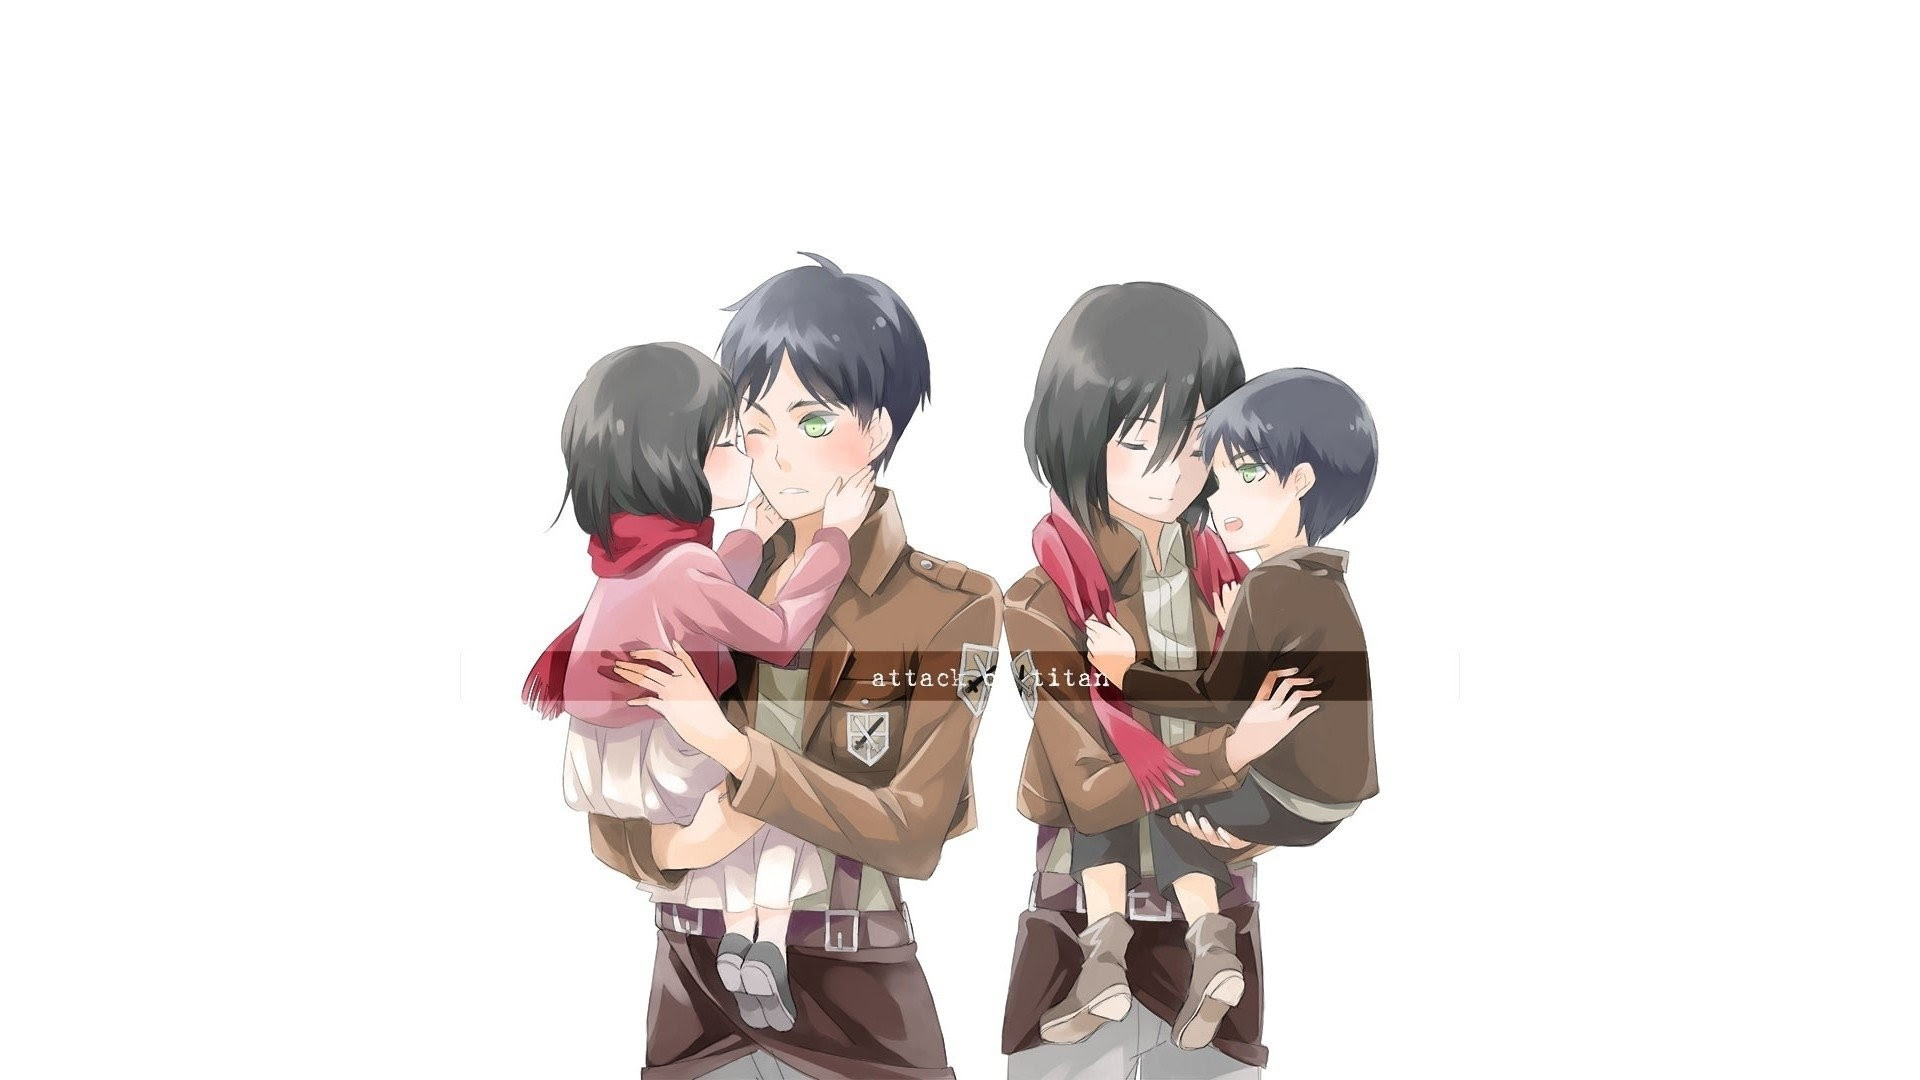 Gambar Anime Attack On Titan Eren Dan Mikasa Anime Wallpapers